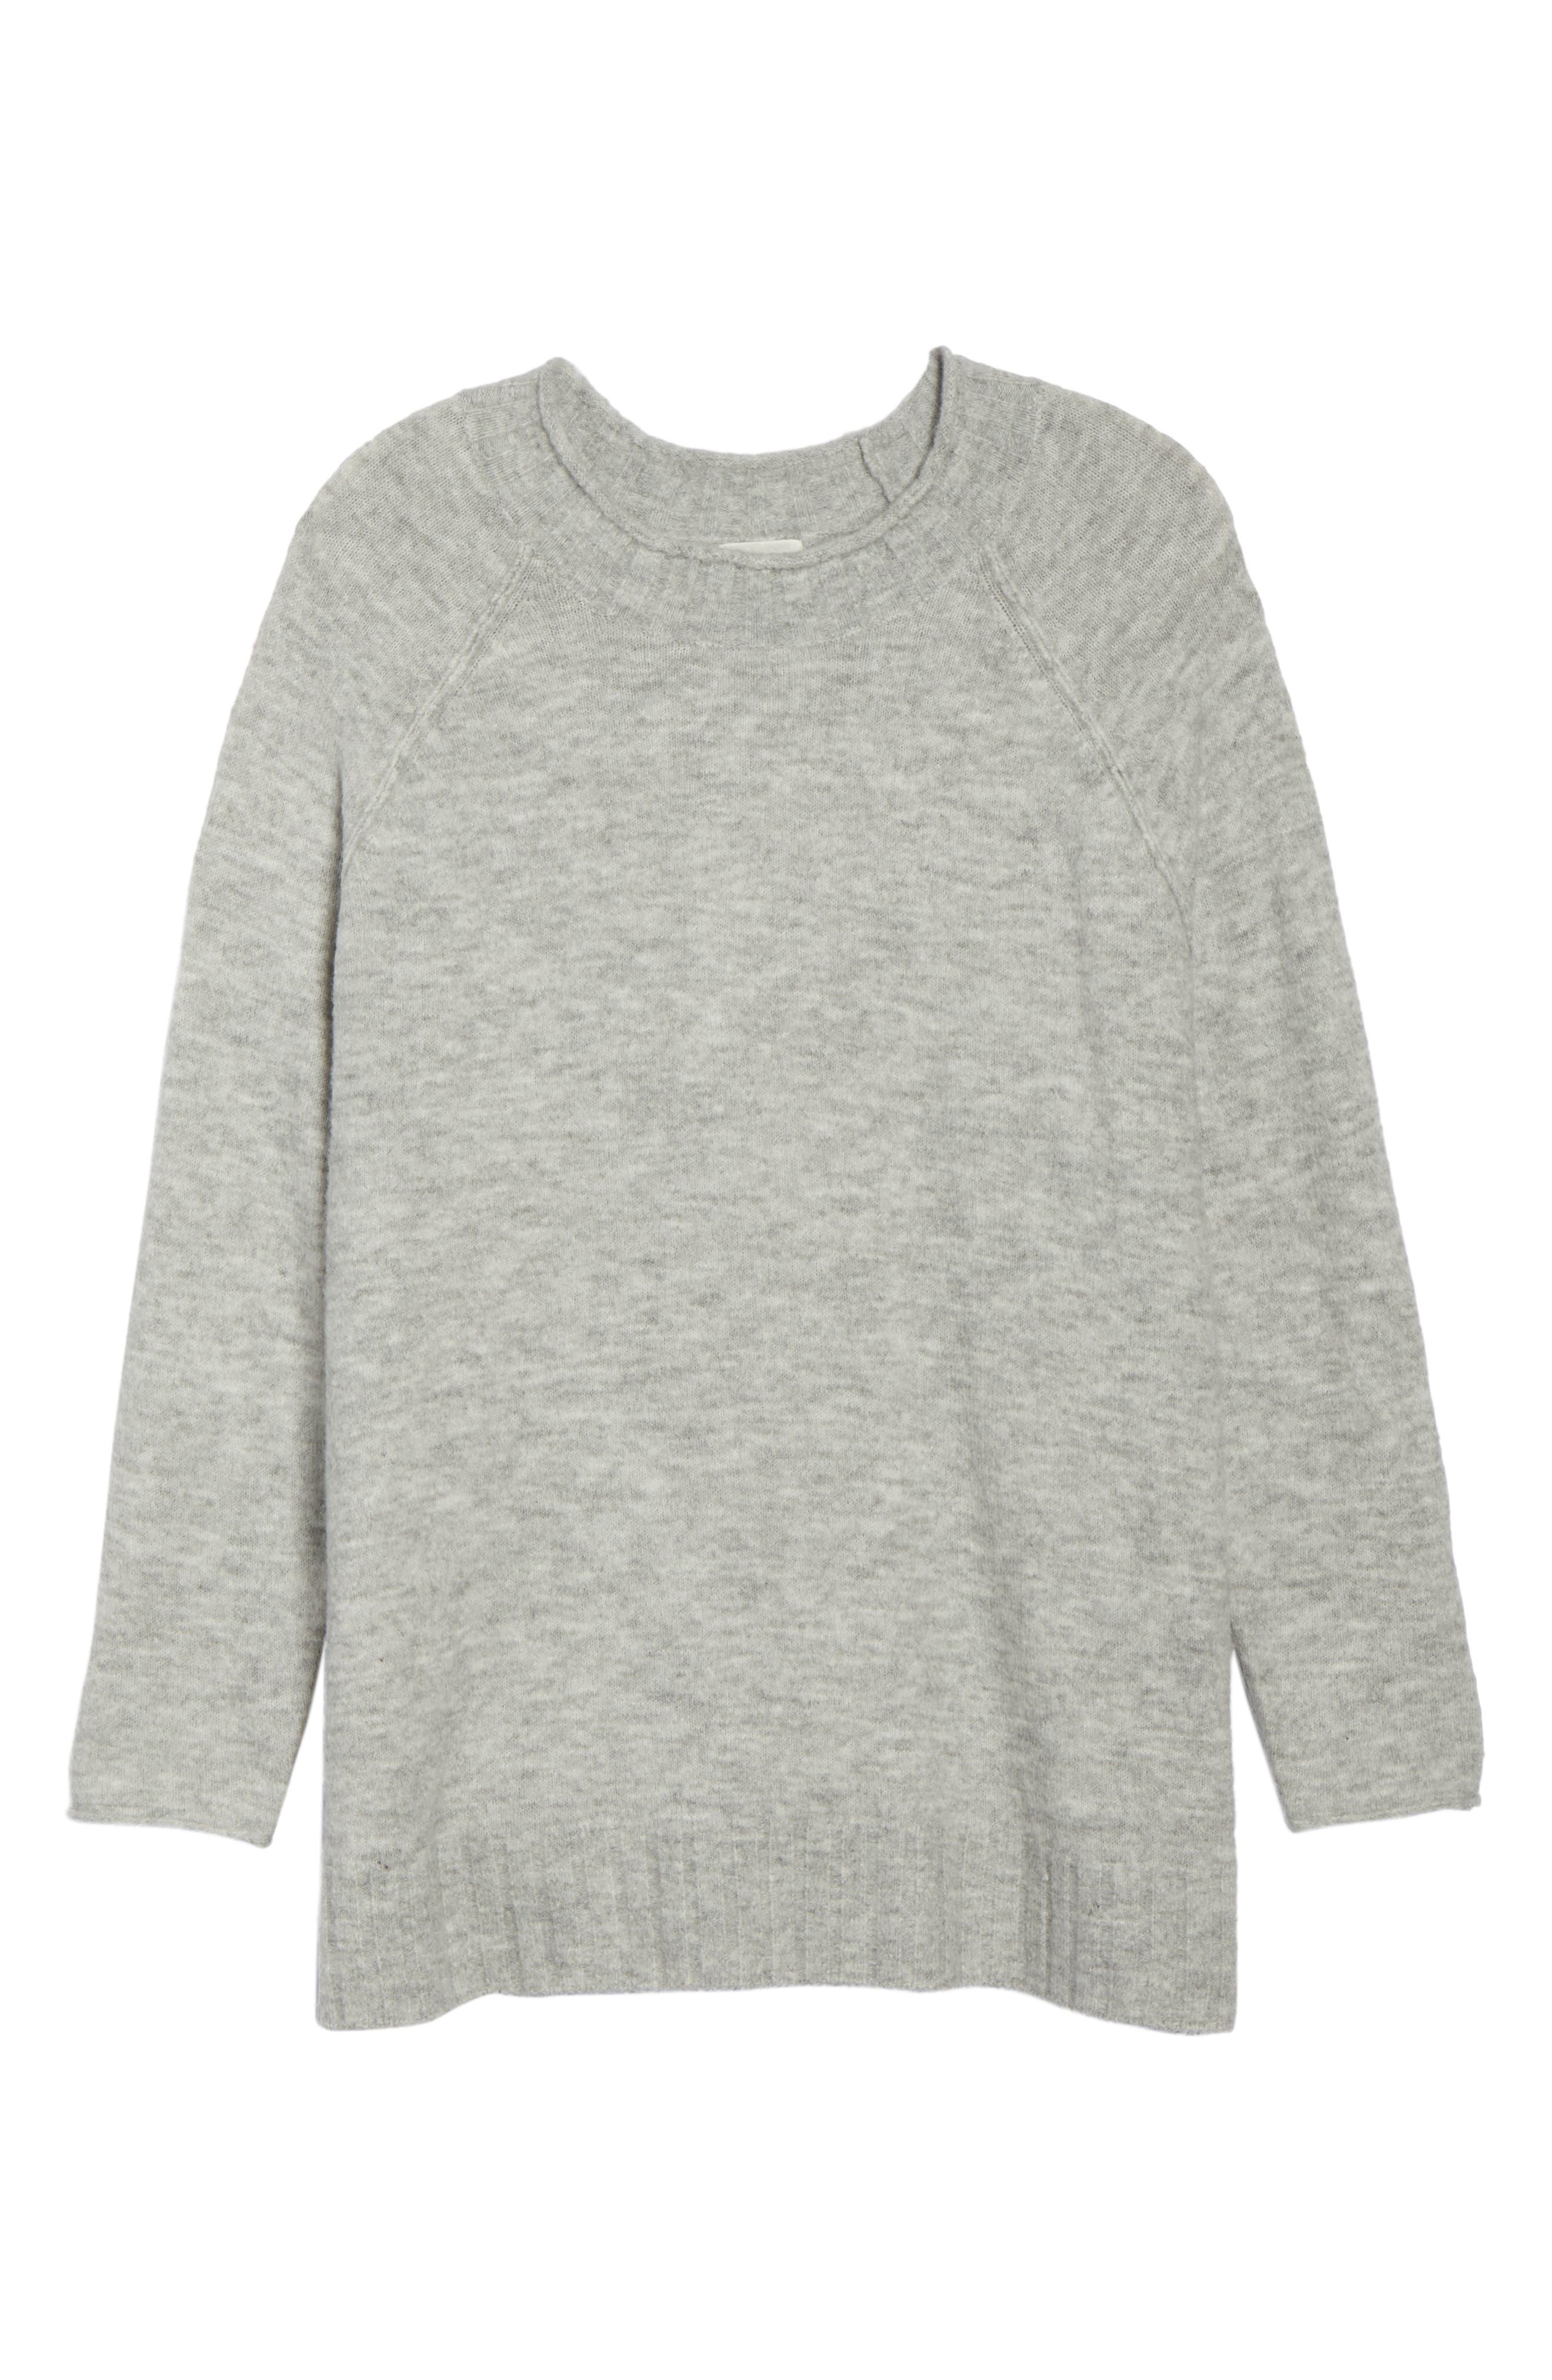 Cozy Crewneck Sweater,                             Alternate thumbnail 6, color,                             GREY HEATHER